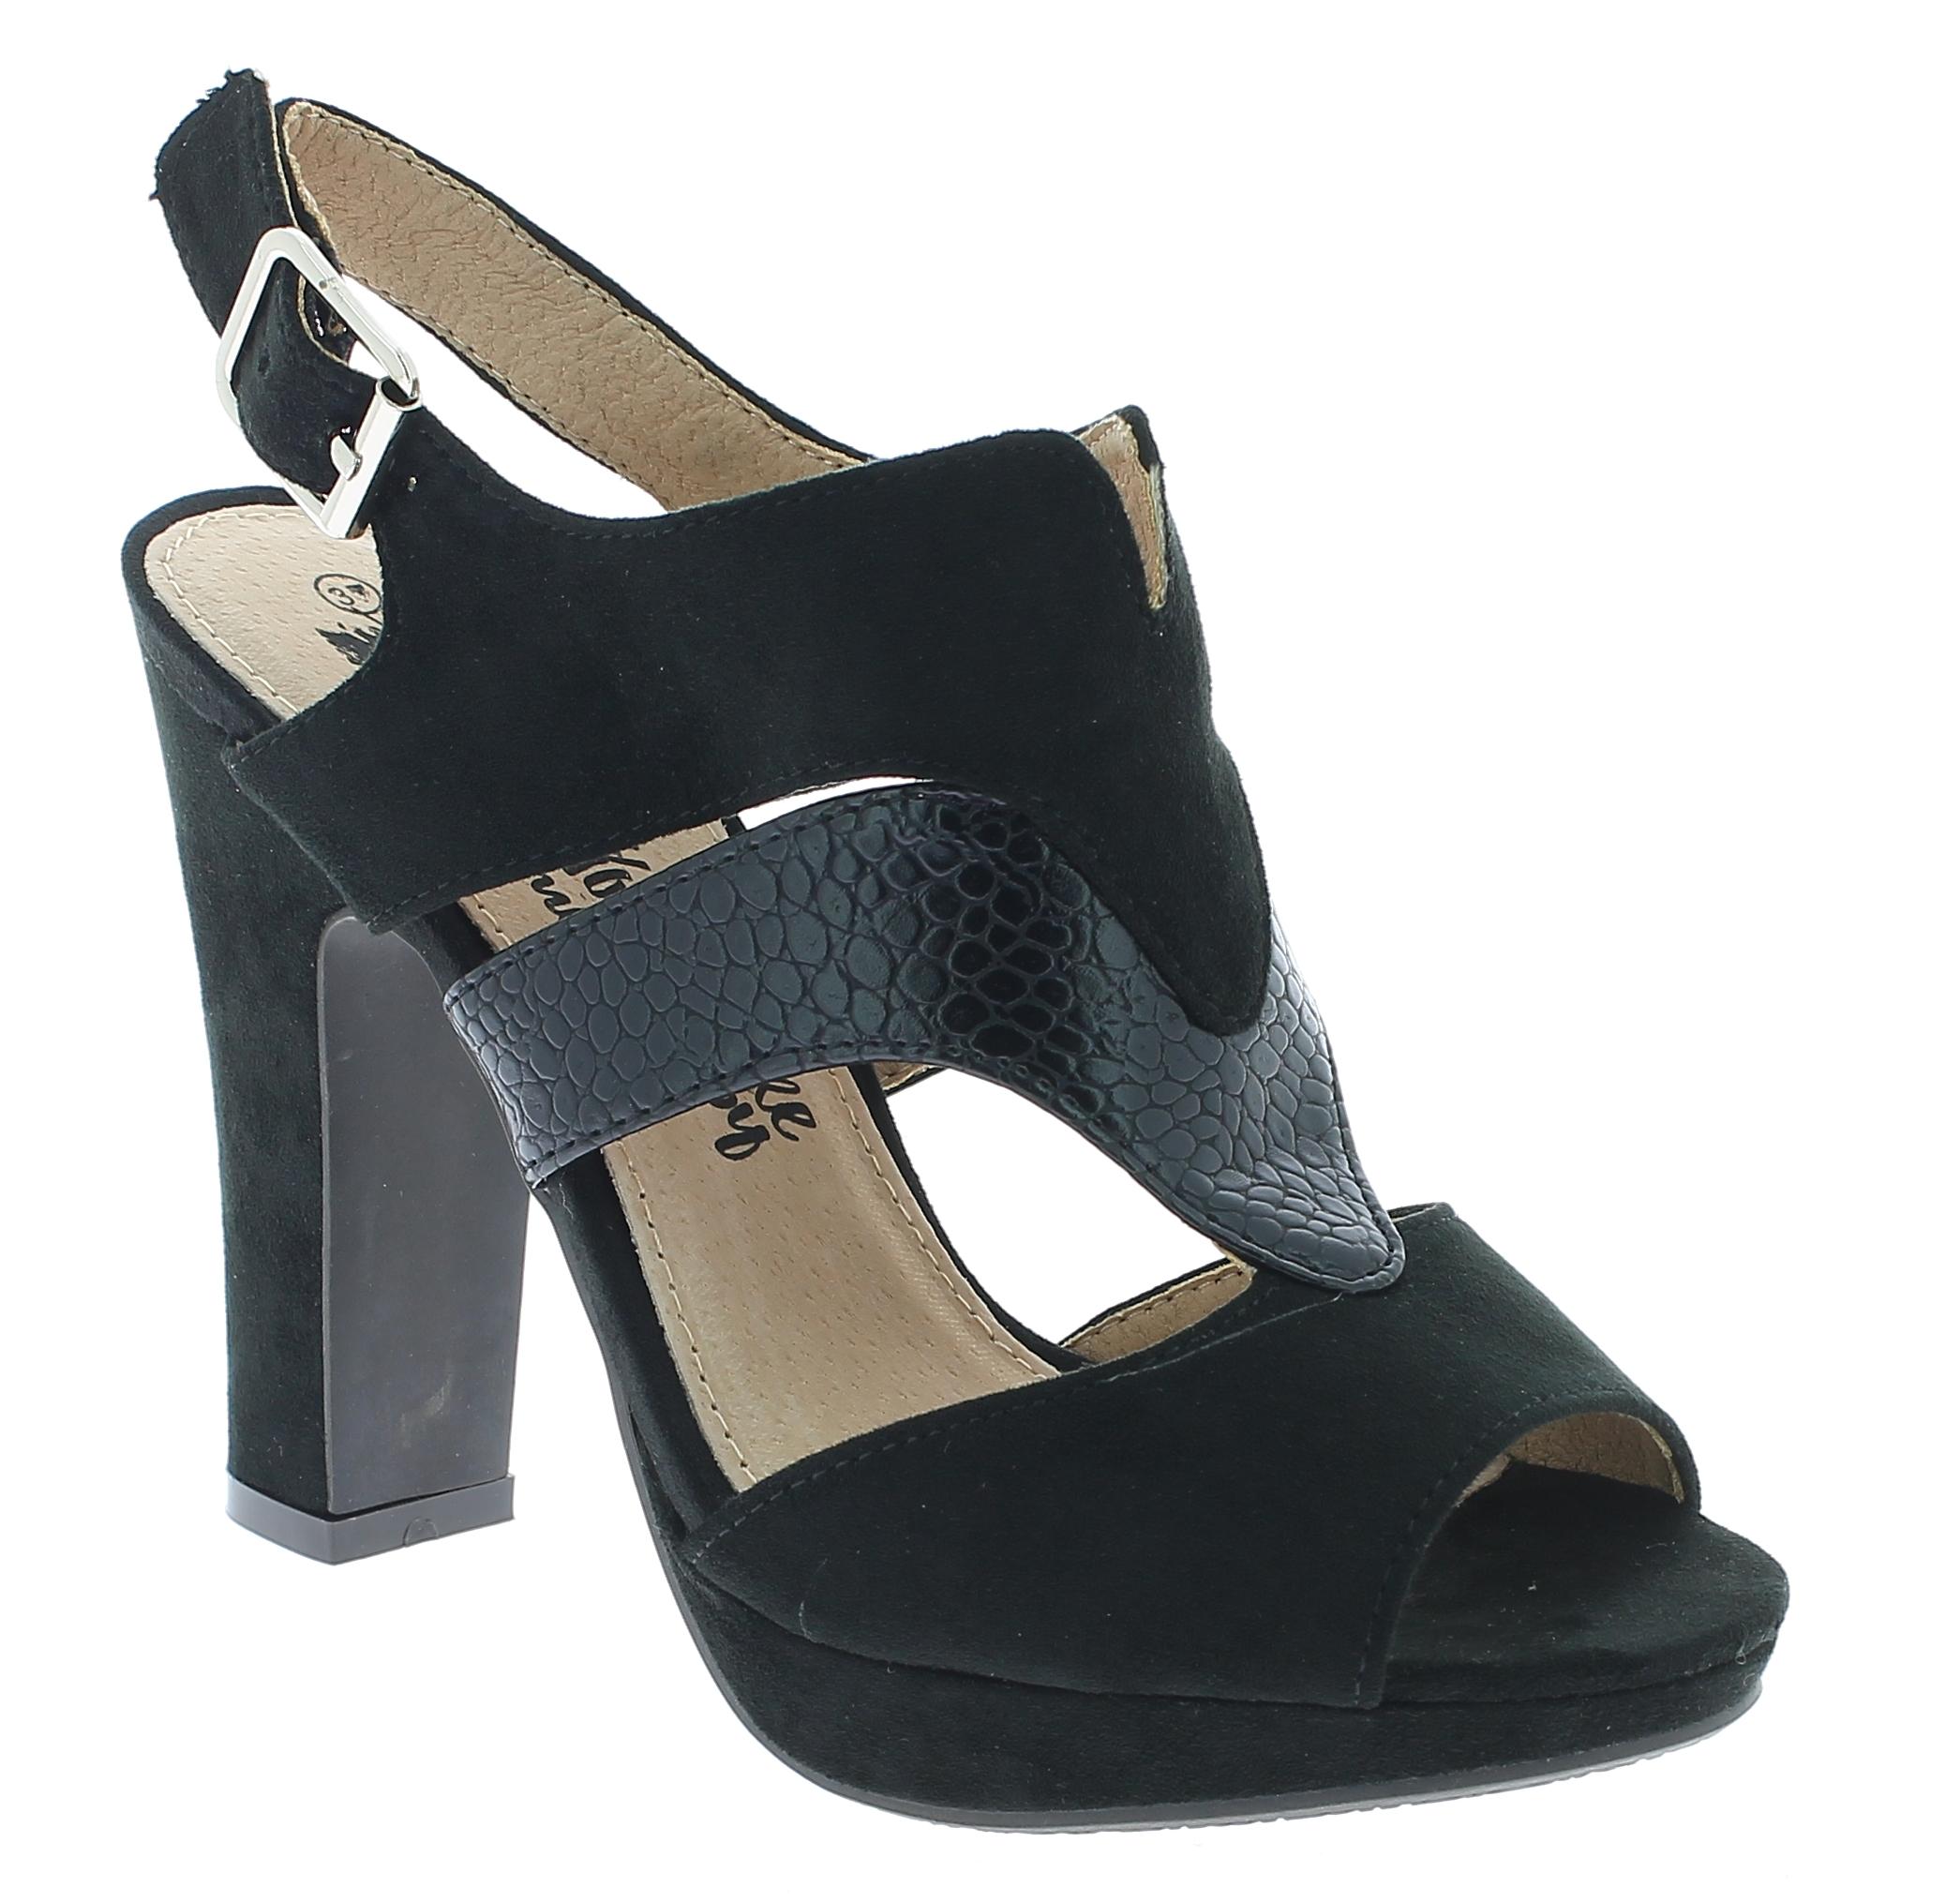 XTI Γυναικείο Πέδιλο 46626 Μαύρο - IqShoes - 46626 BLACK-black-37/1/15/27 παπούτσια  πέδιλα